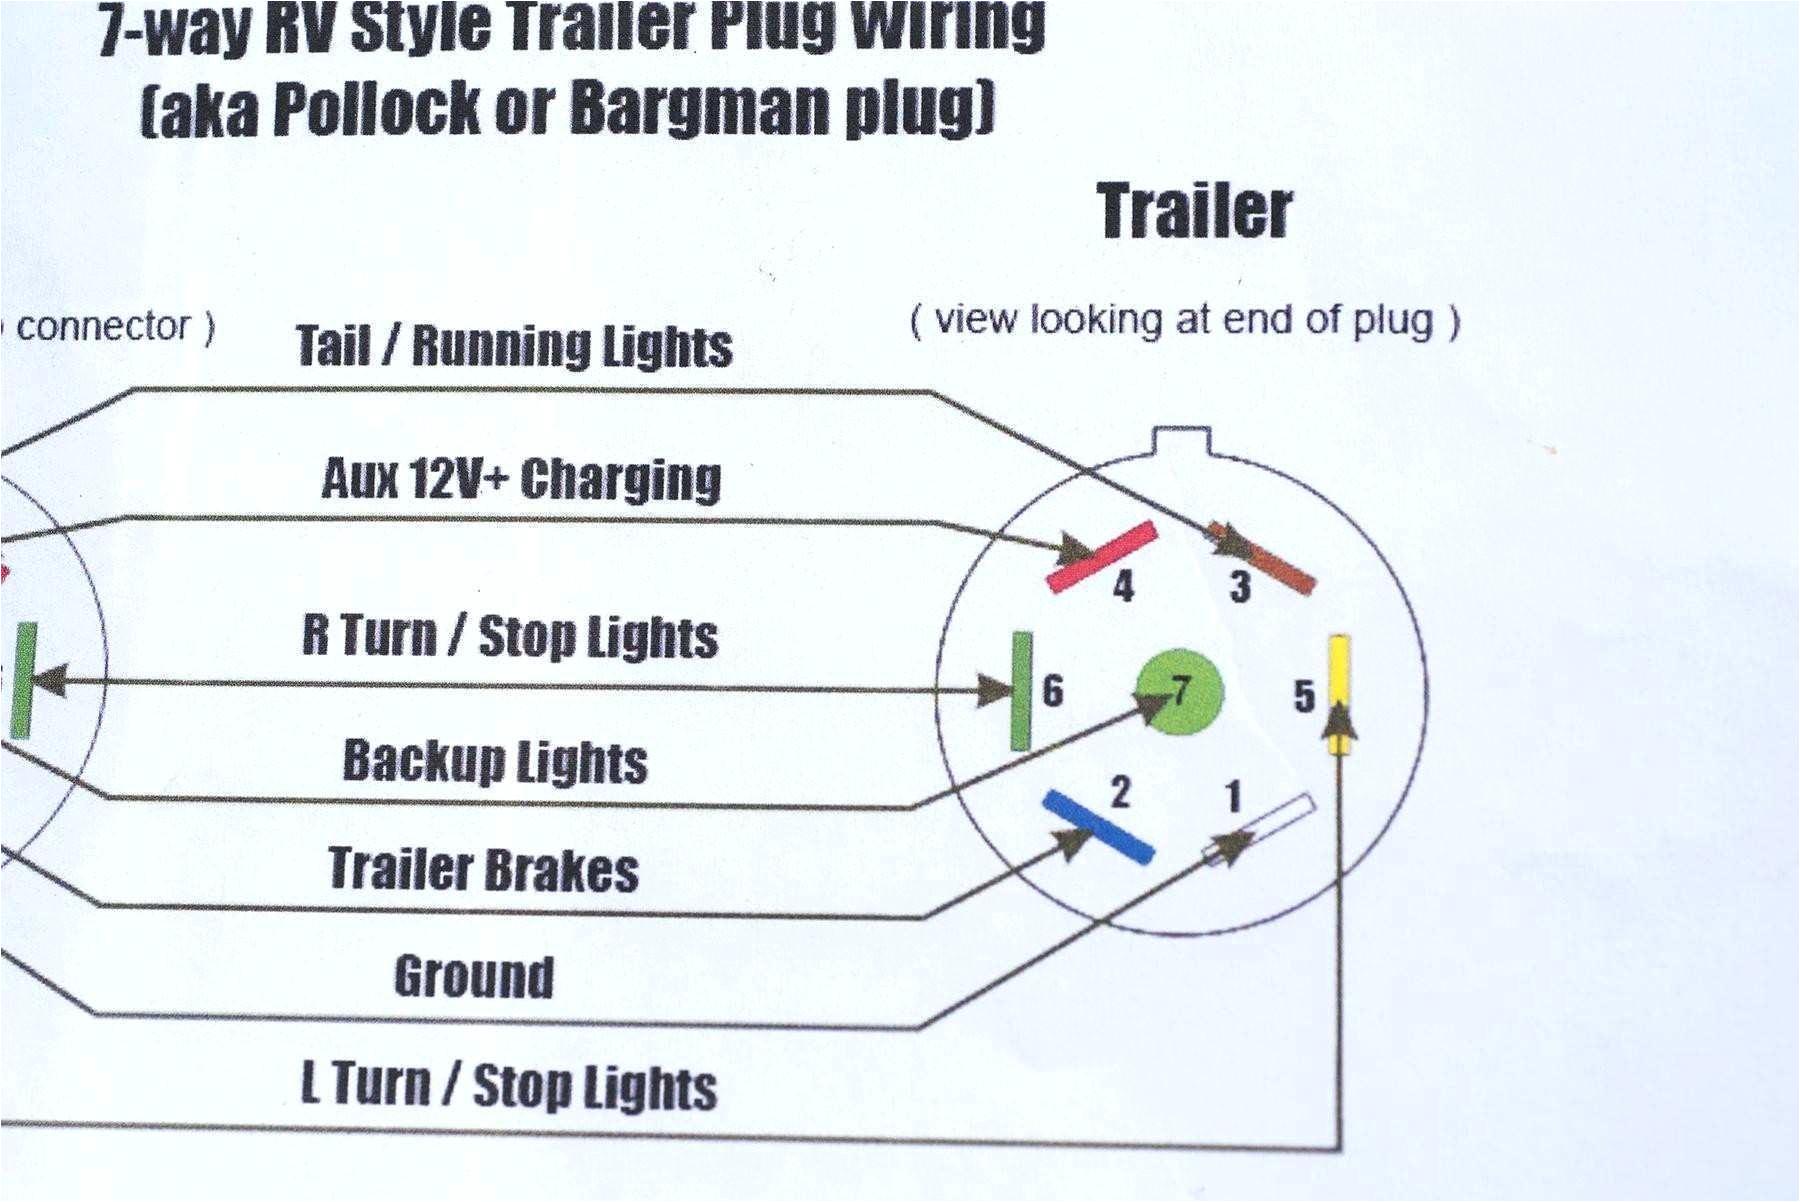 peterson trailer wiring diagram wiring diagram sheetpeterson trailer wiring diagram database wiring diagram peterson trailer light